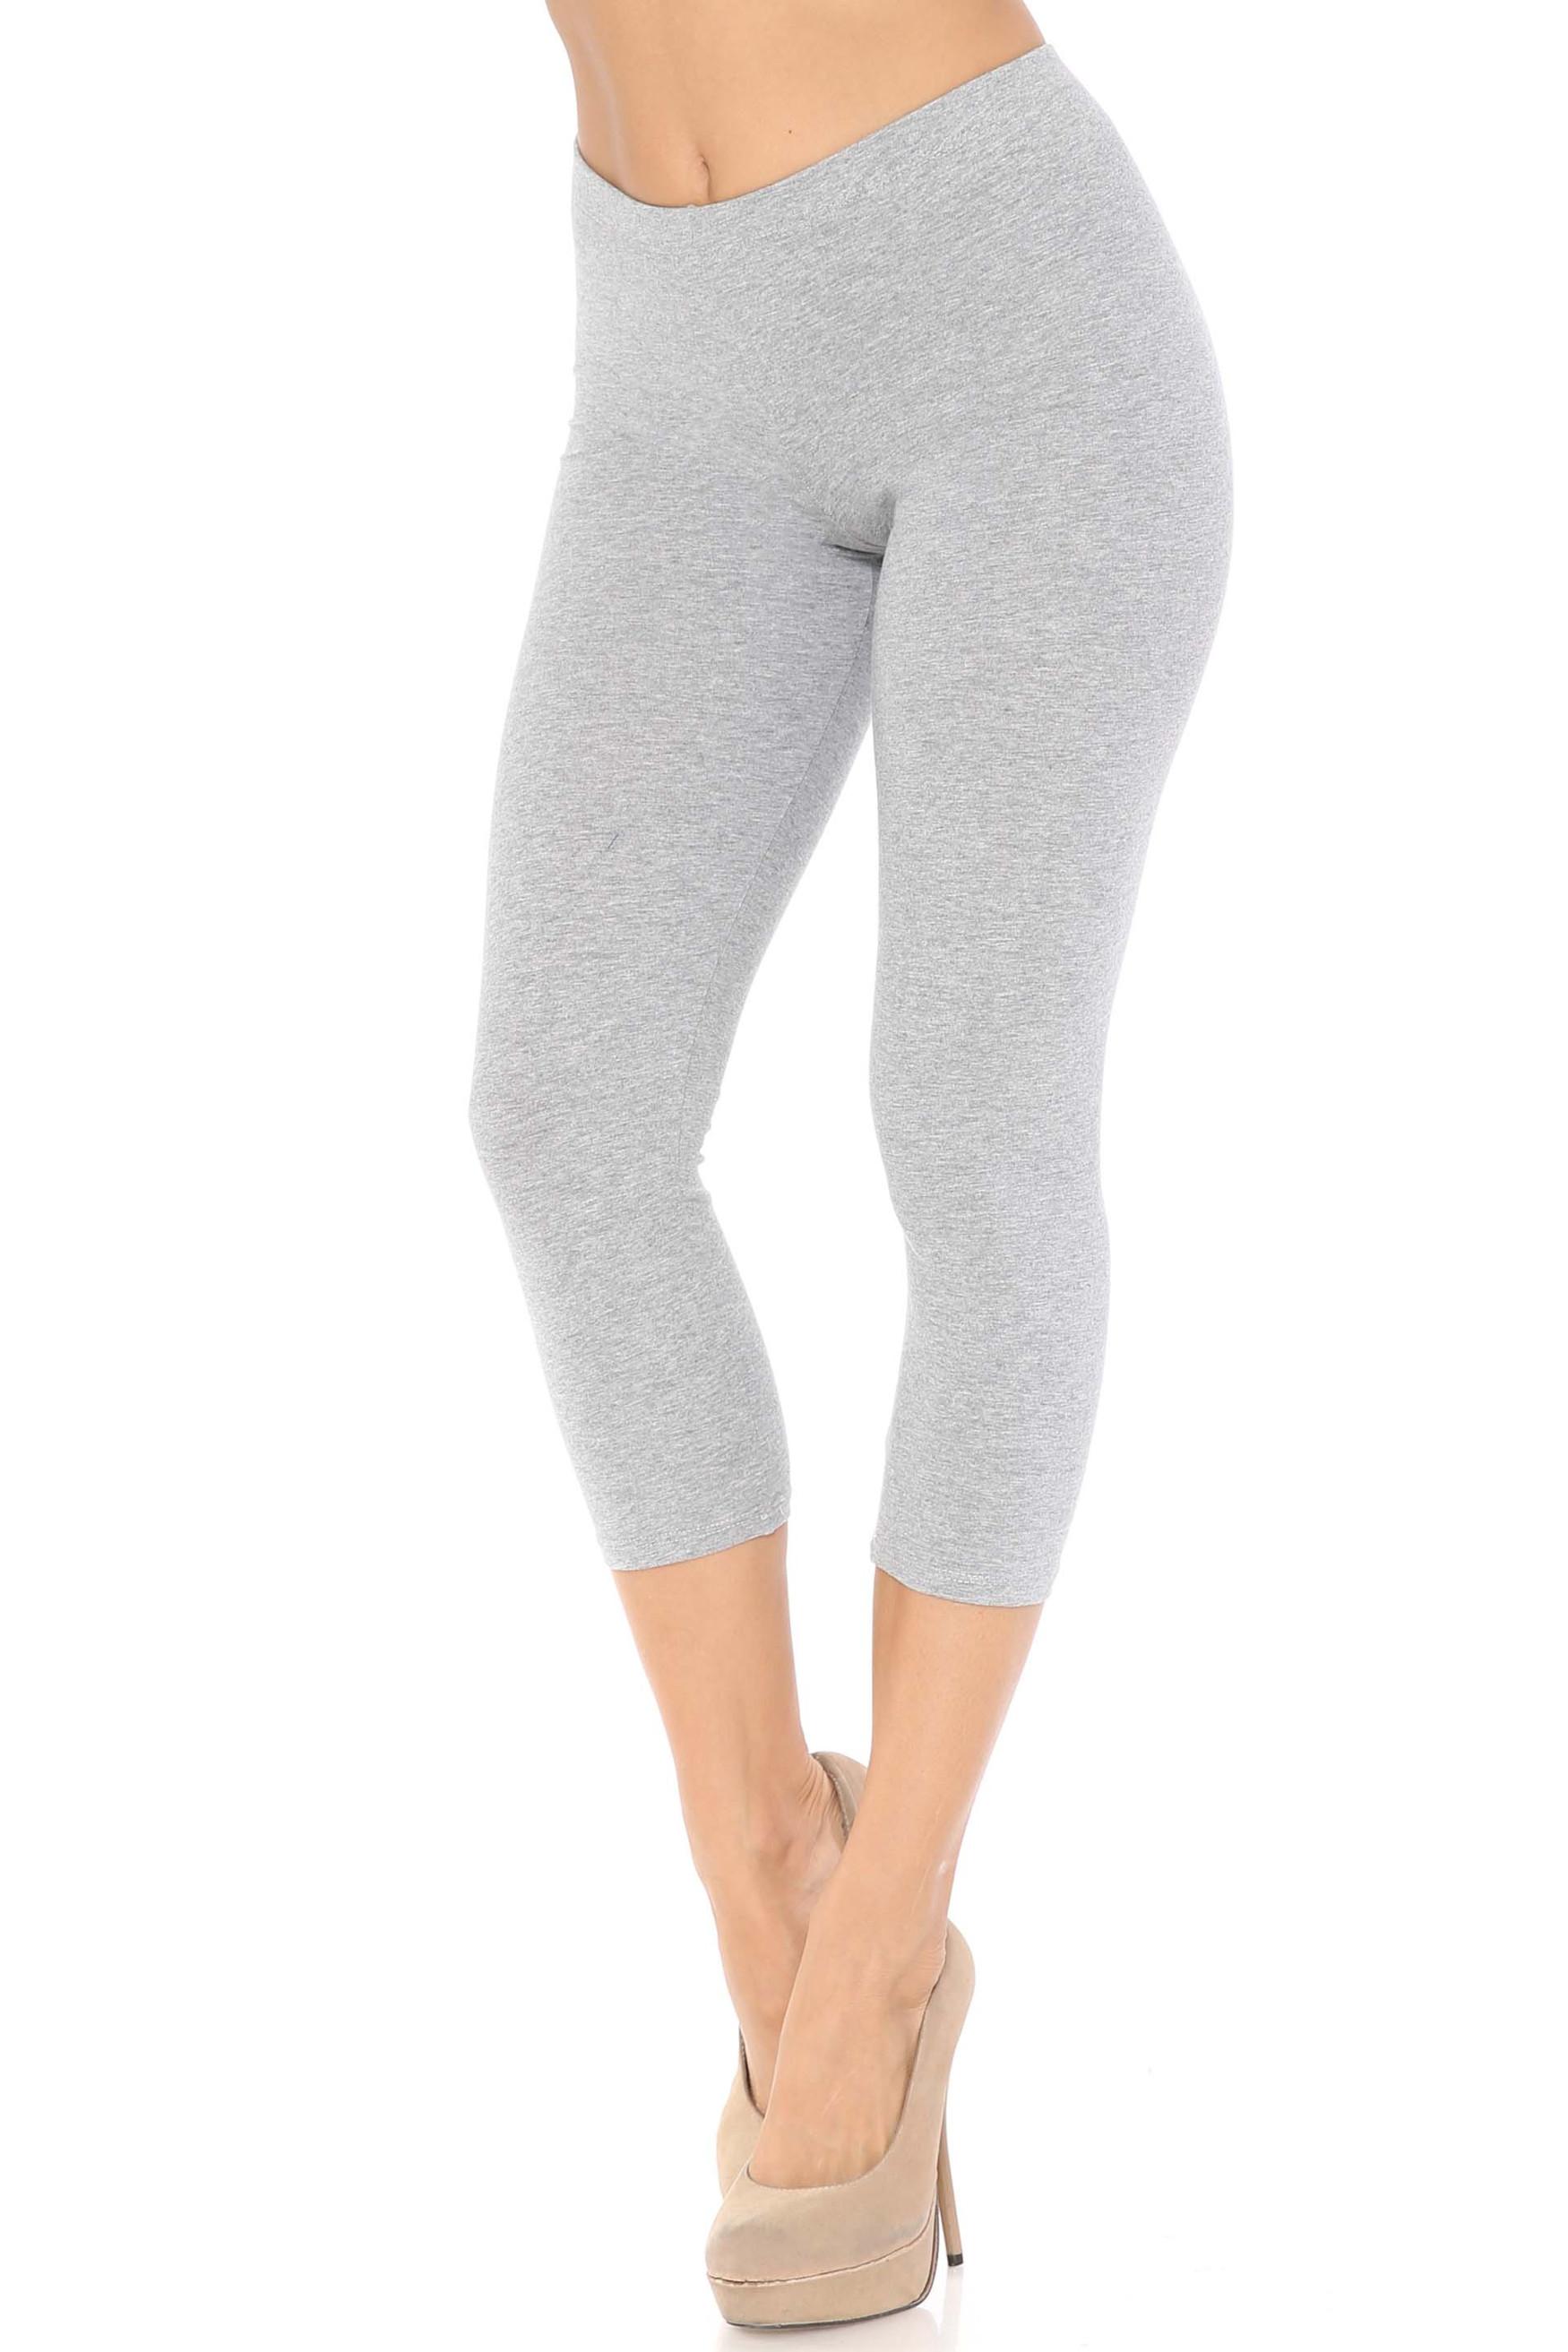 45 degree angle of heather gray USA Cotton Capri Length Leggings